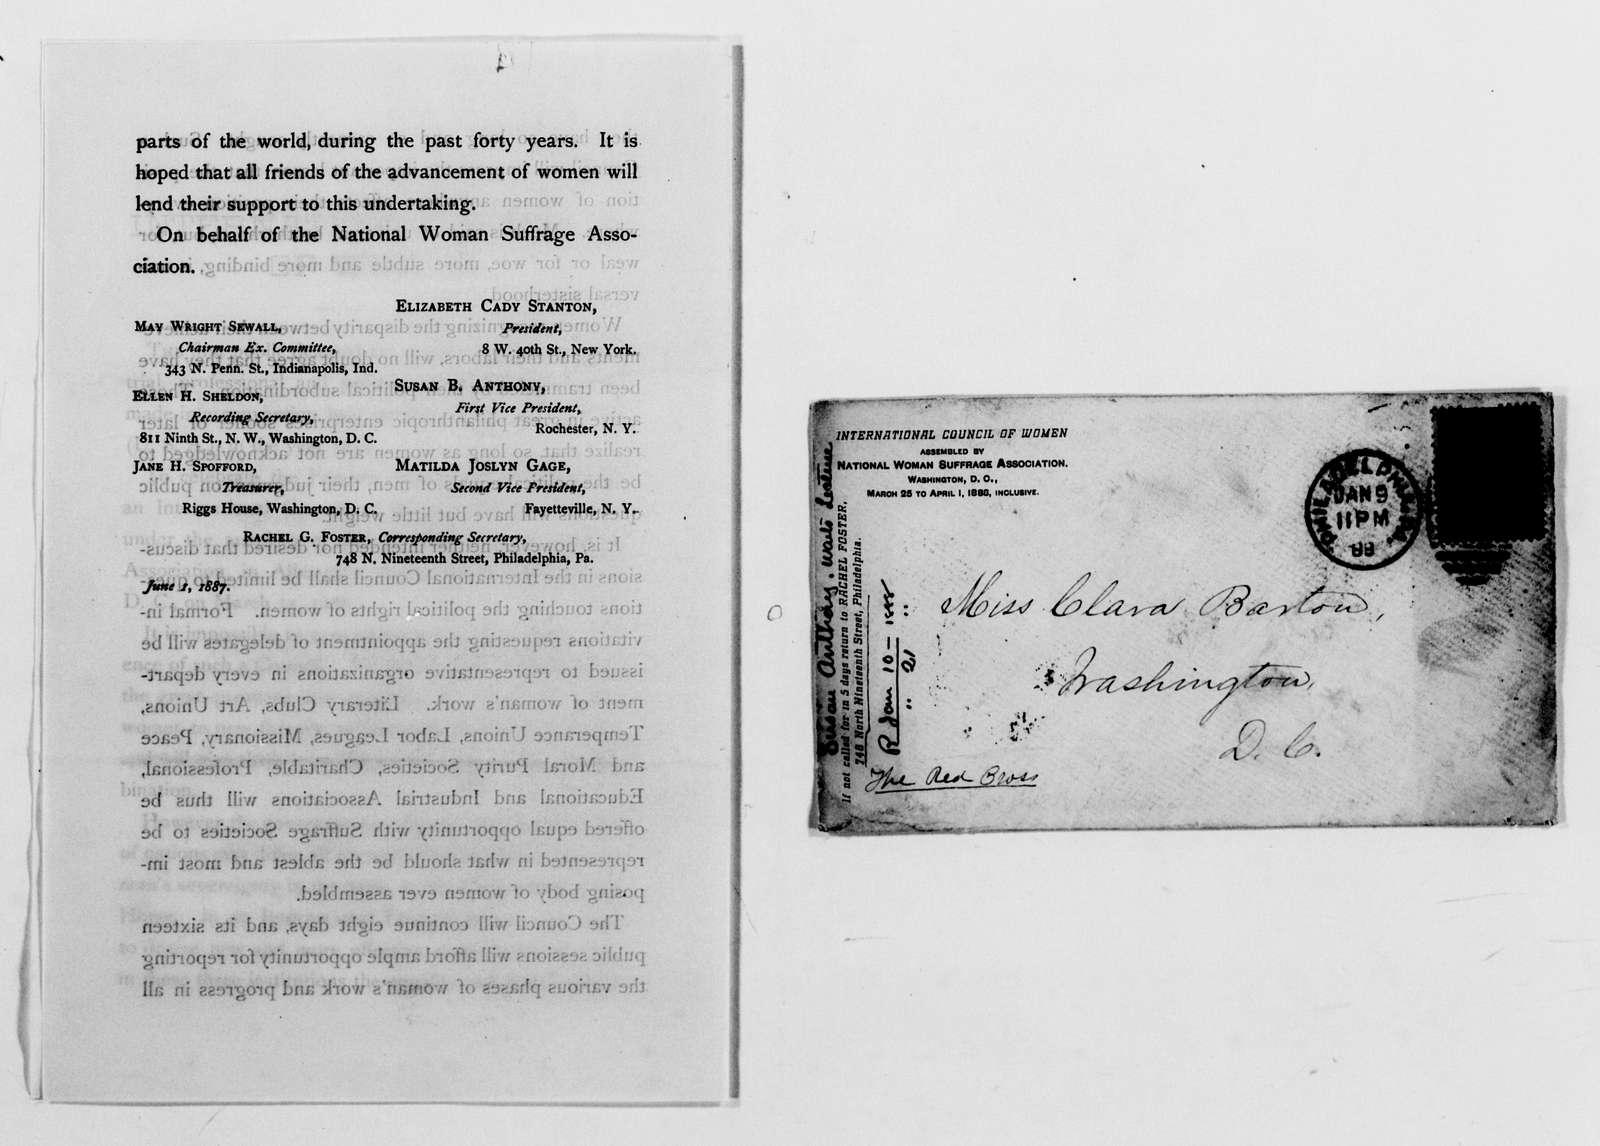 Clara Barton Papers: General Correspondence, 1838-1912; Anthony, Susan B., 1869-1903